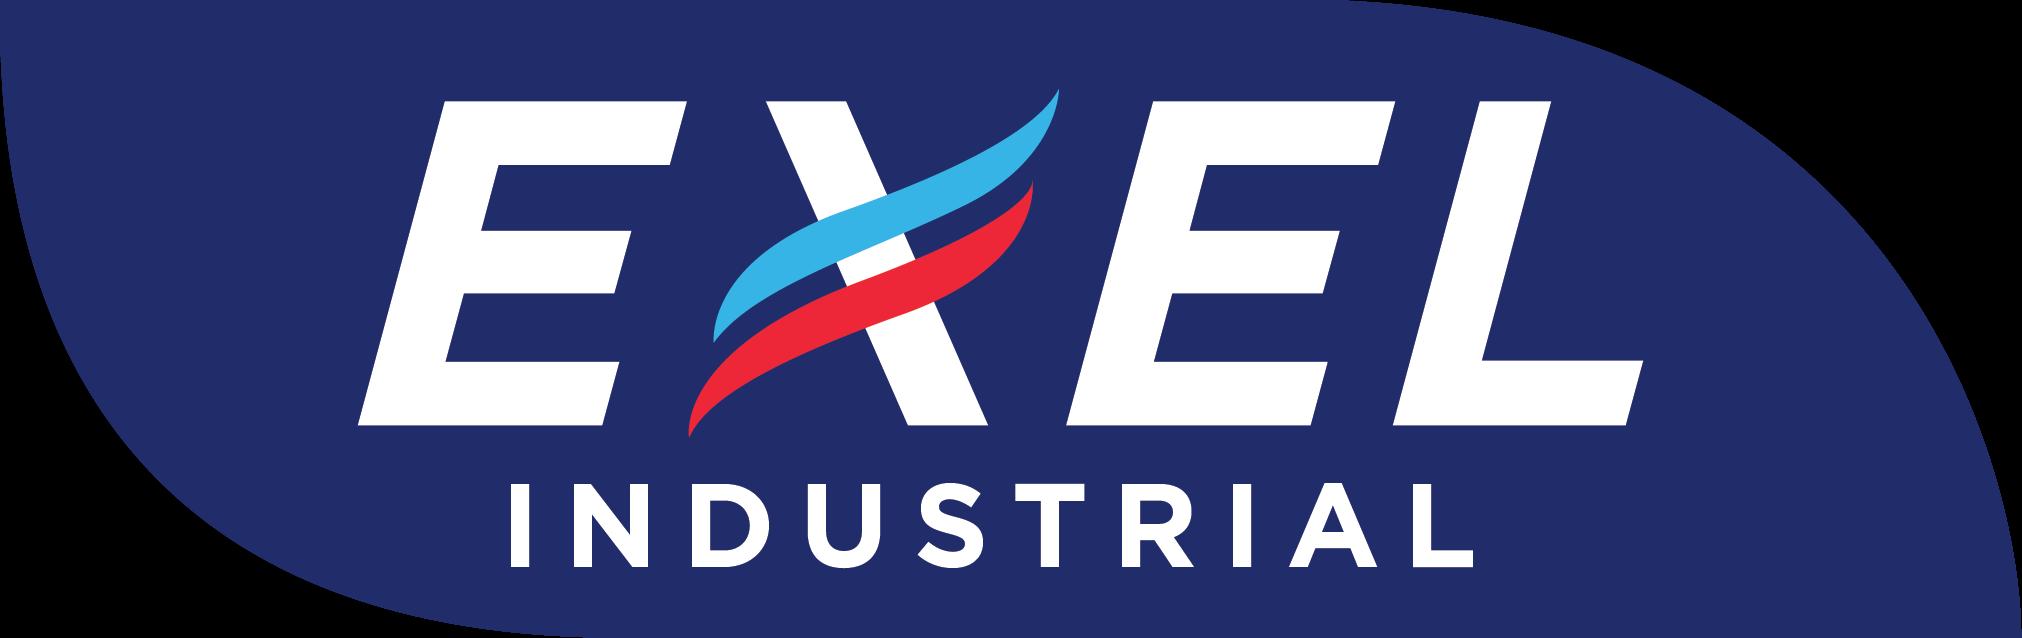 Exel Industrial